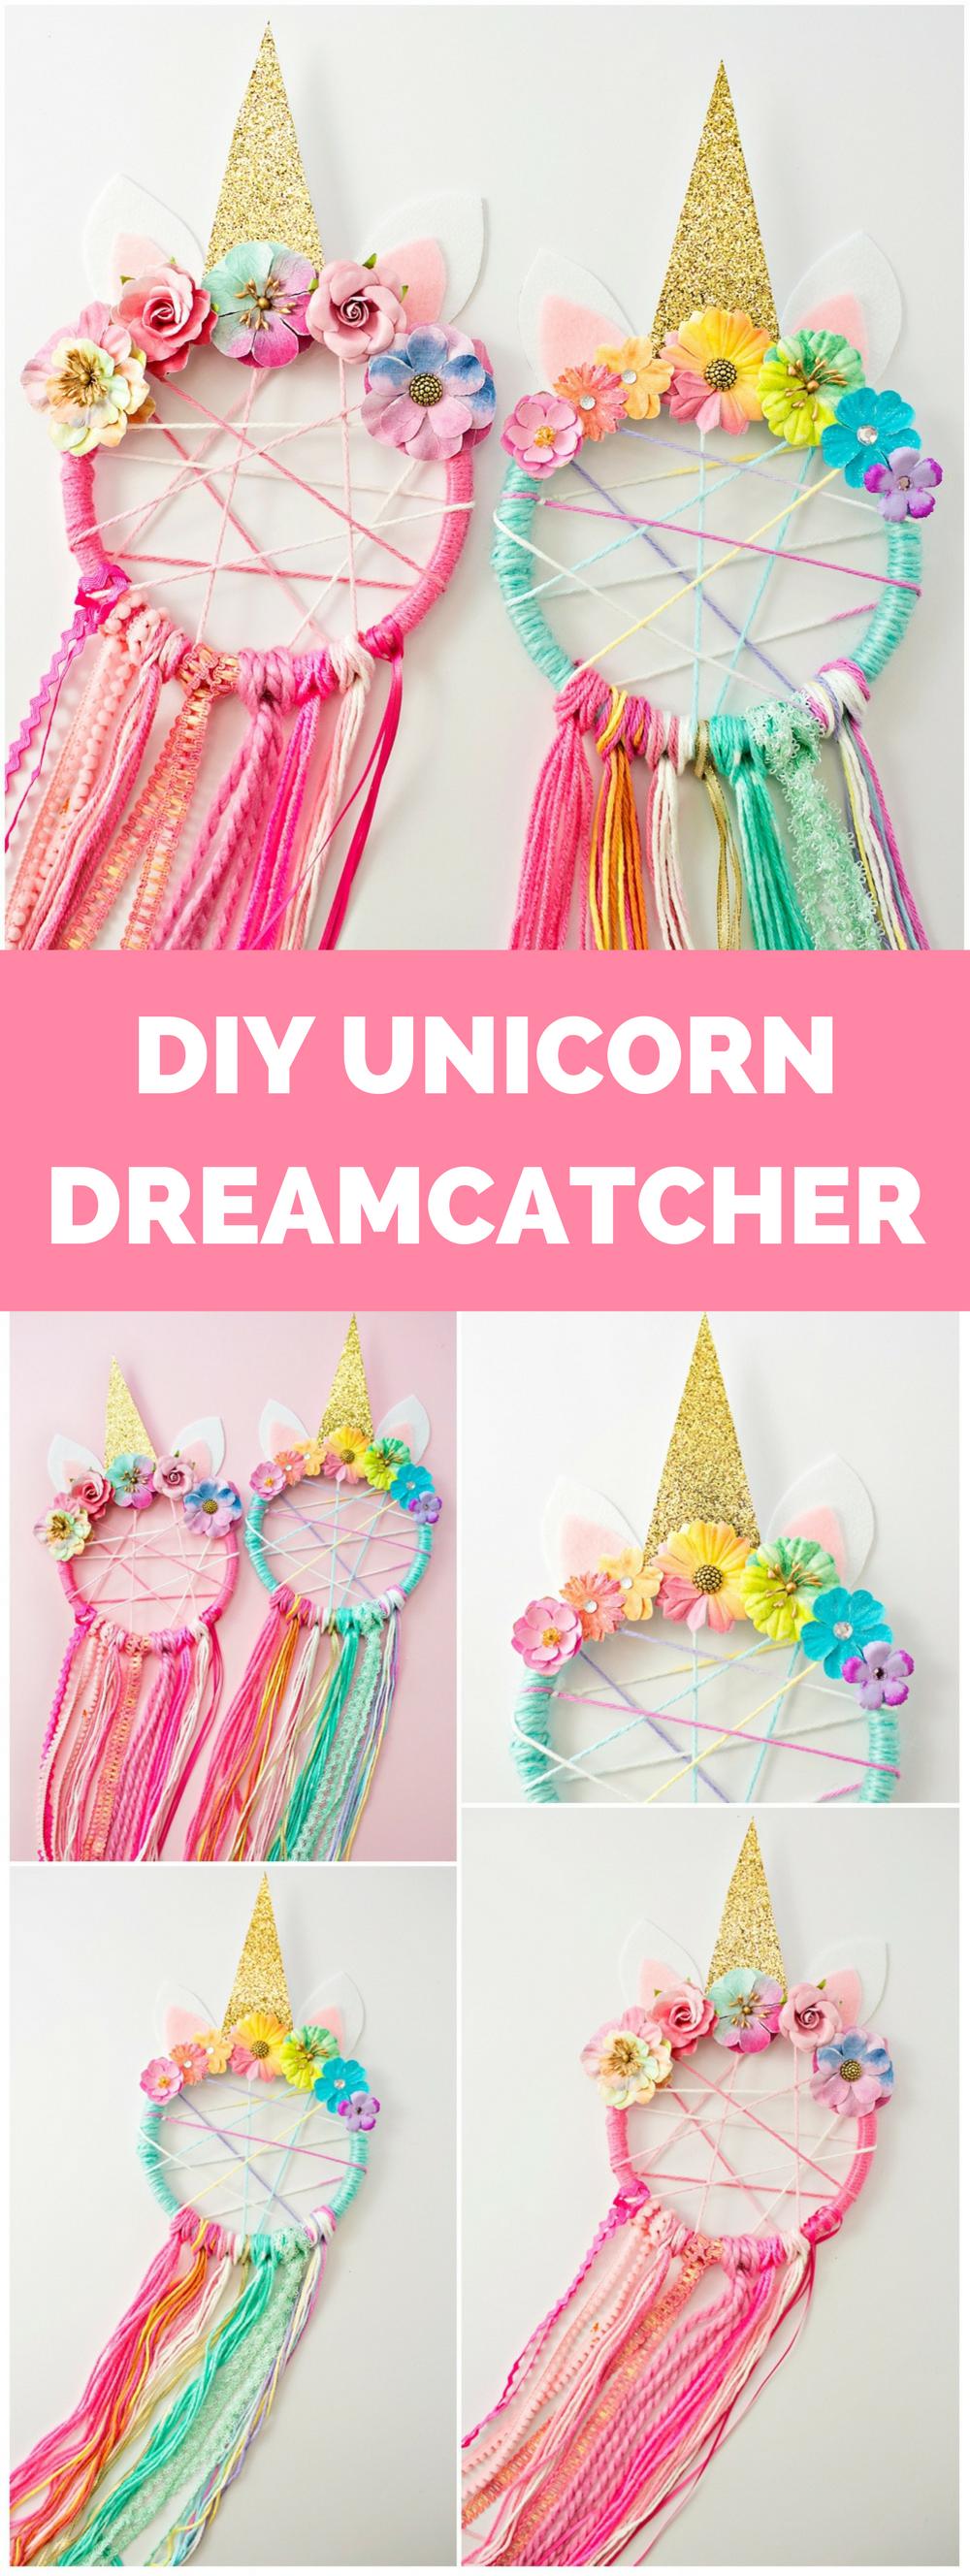 DIY Unicorn Dreamcatcher #unicornparty #unicorncrafts #unicornio #diyunicorn #unicorn #dreamcatcher #unicorncrafts